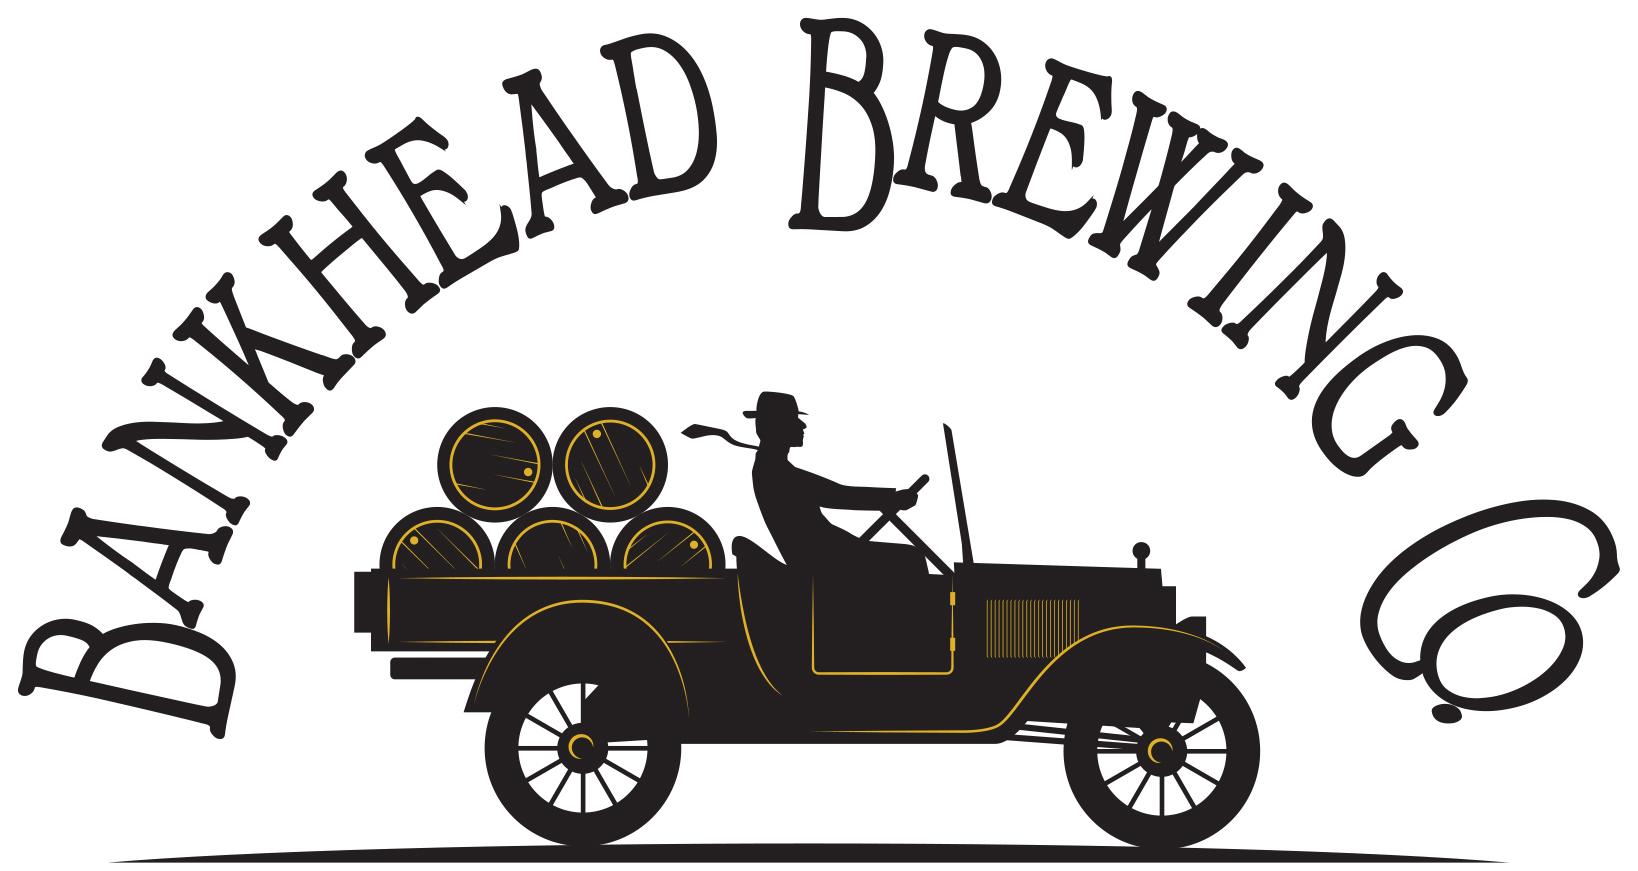 Bankhead Brewing Company logo